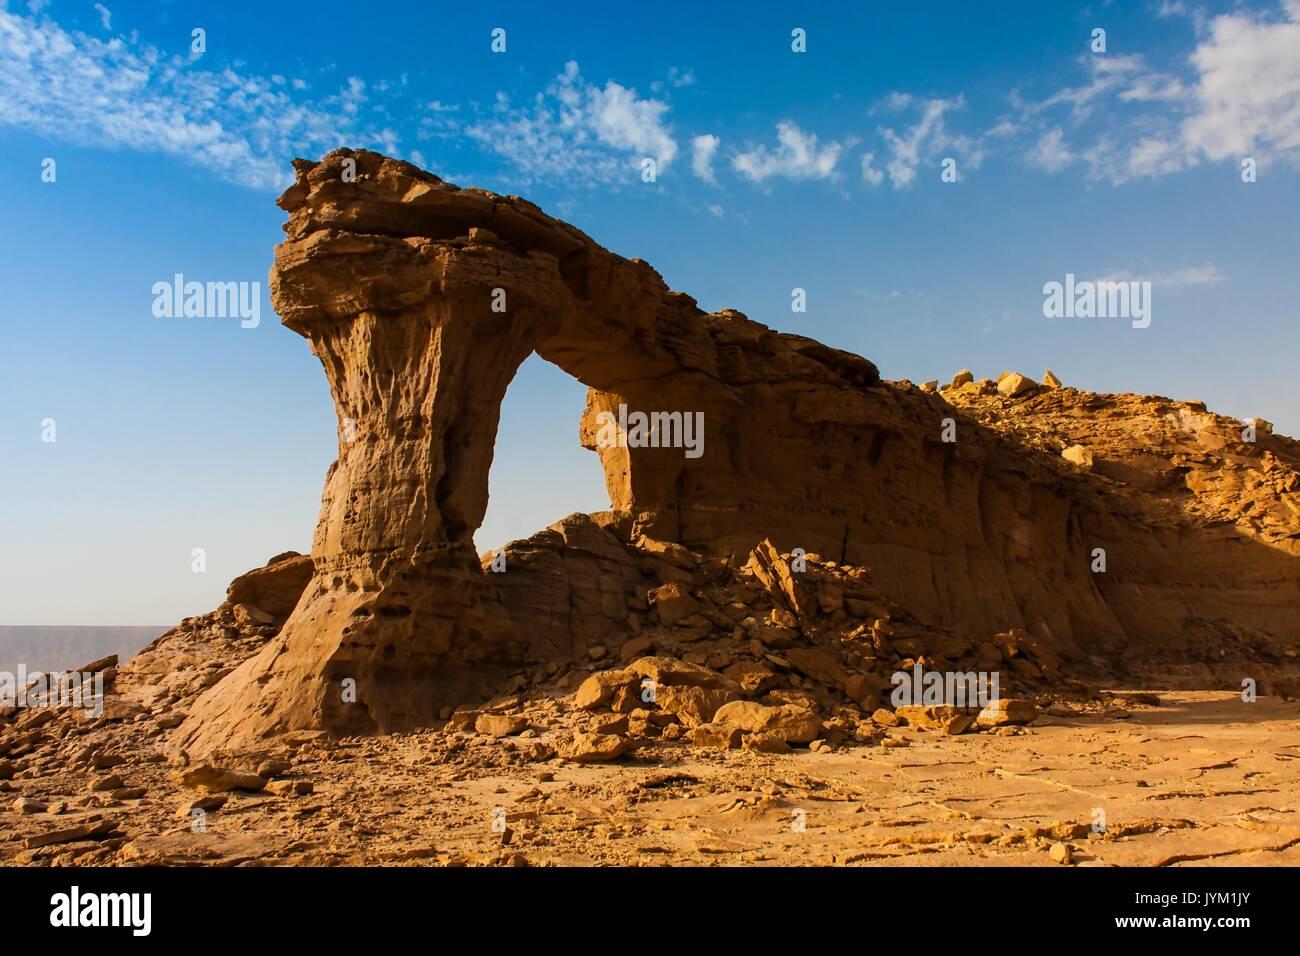 Arco Naturale di Riyadh, Arabia Saudita Immagini Stock